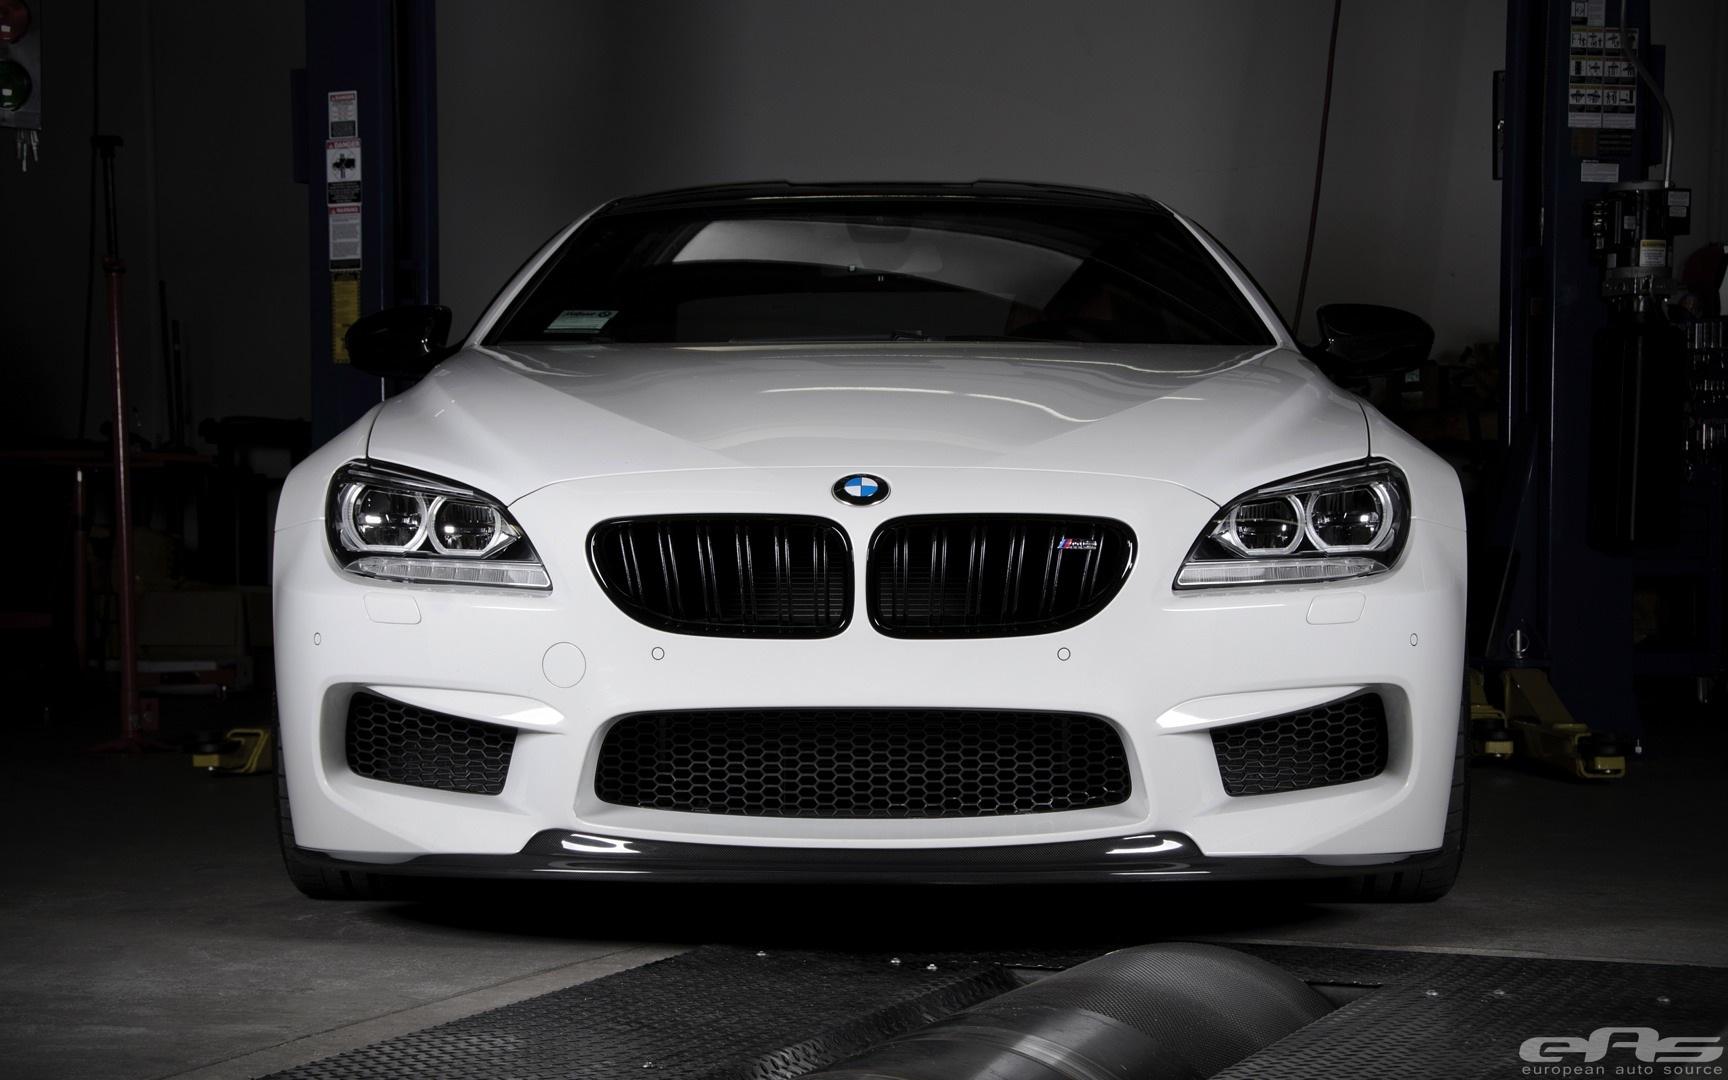 Photo Wallpaper Car Sound System Stunning Alpine White Bmw M6 Gran Coupe Gets Arkym Body